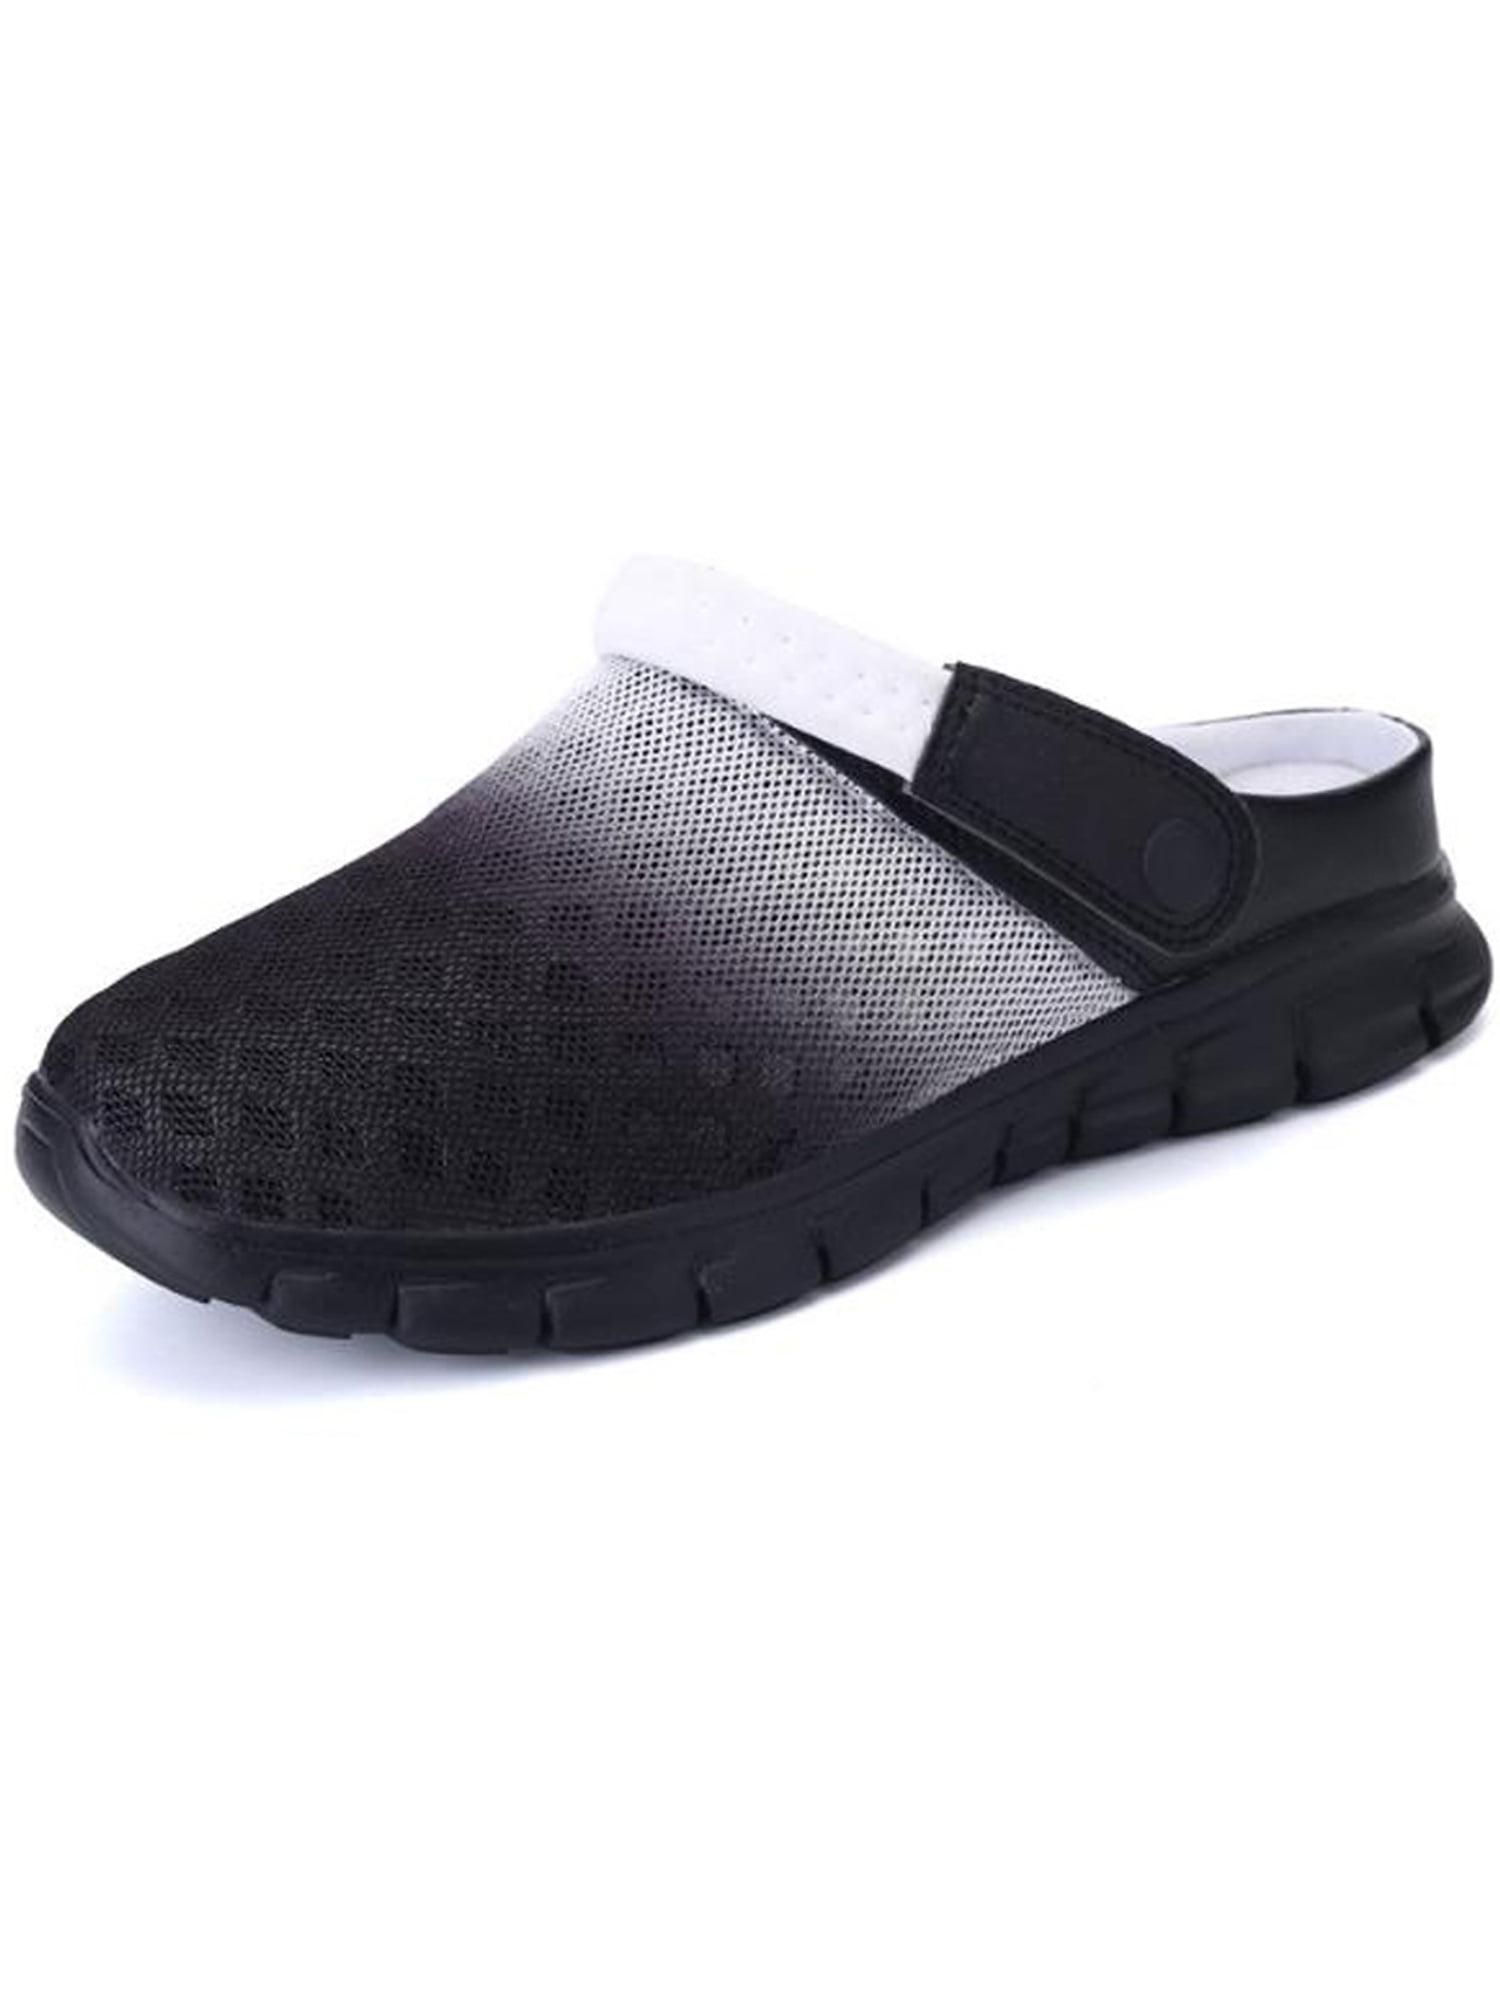 Mens Slip On Shoes Breathable Mesh